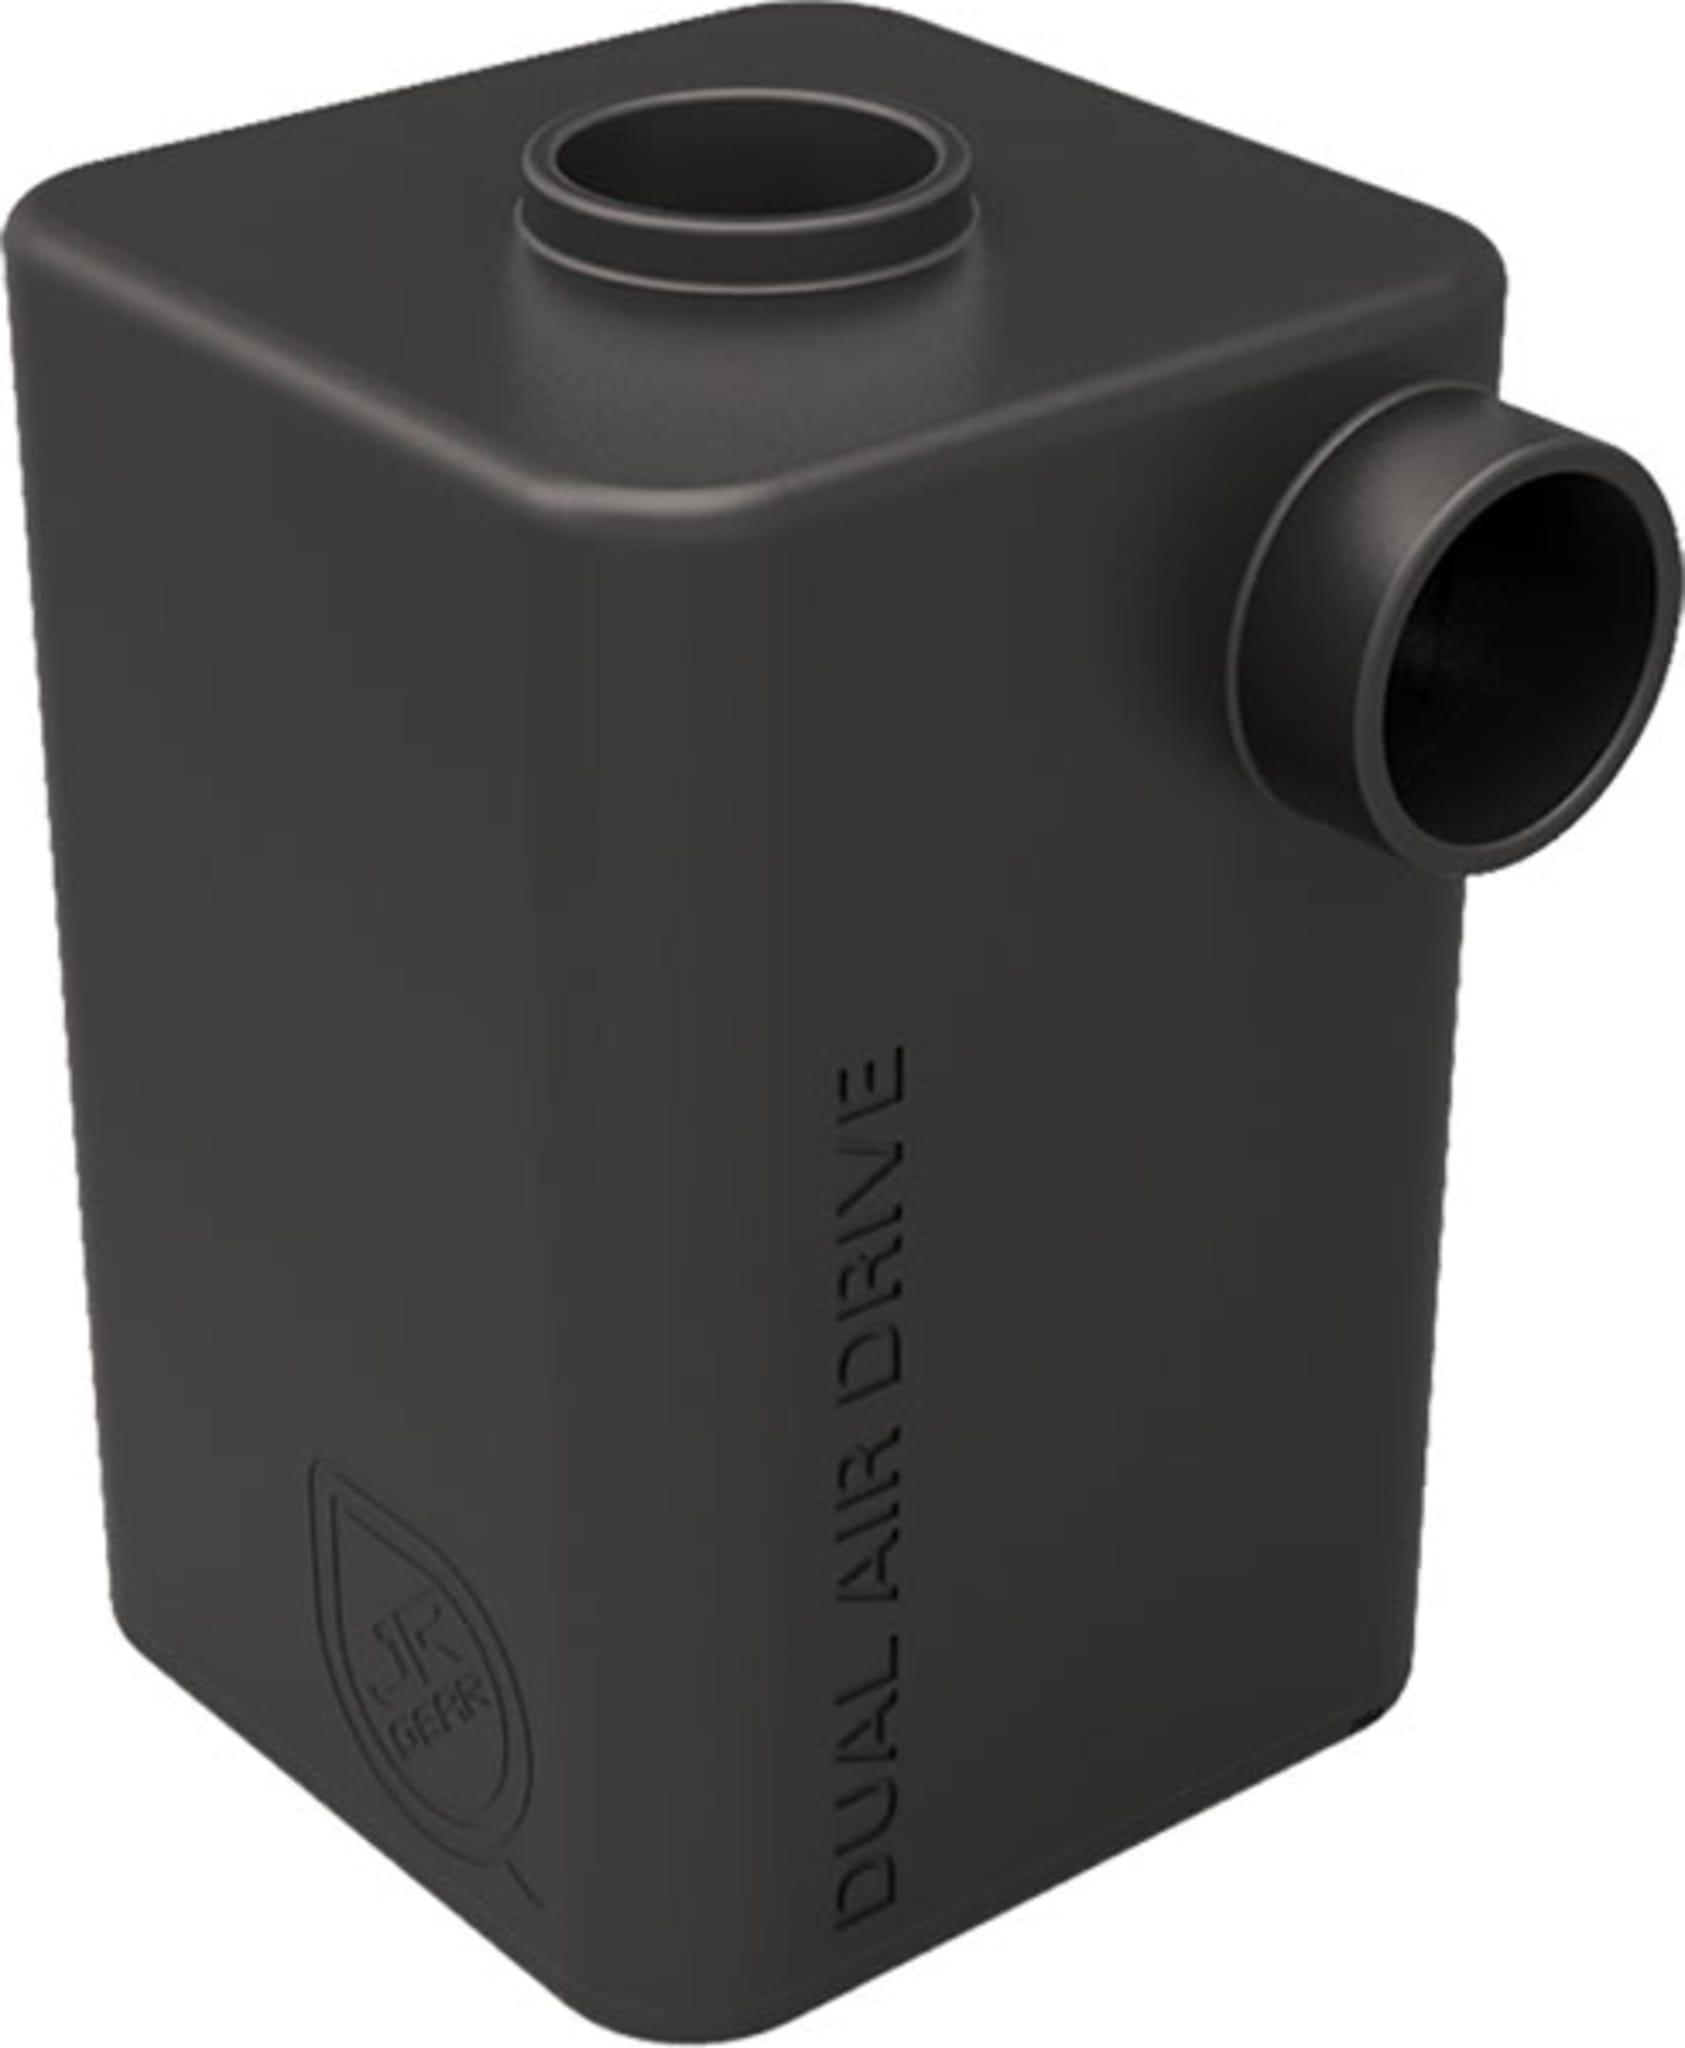 Liten og lett pumpe elektrisk pumpe til underlag